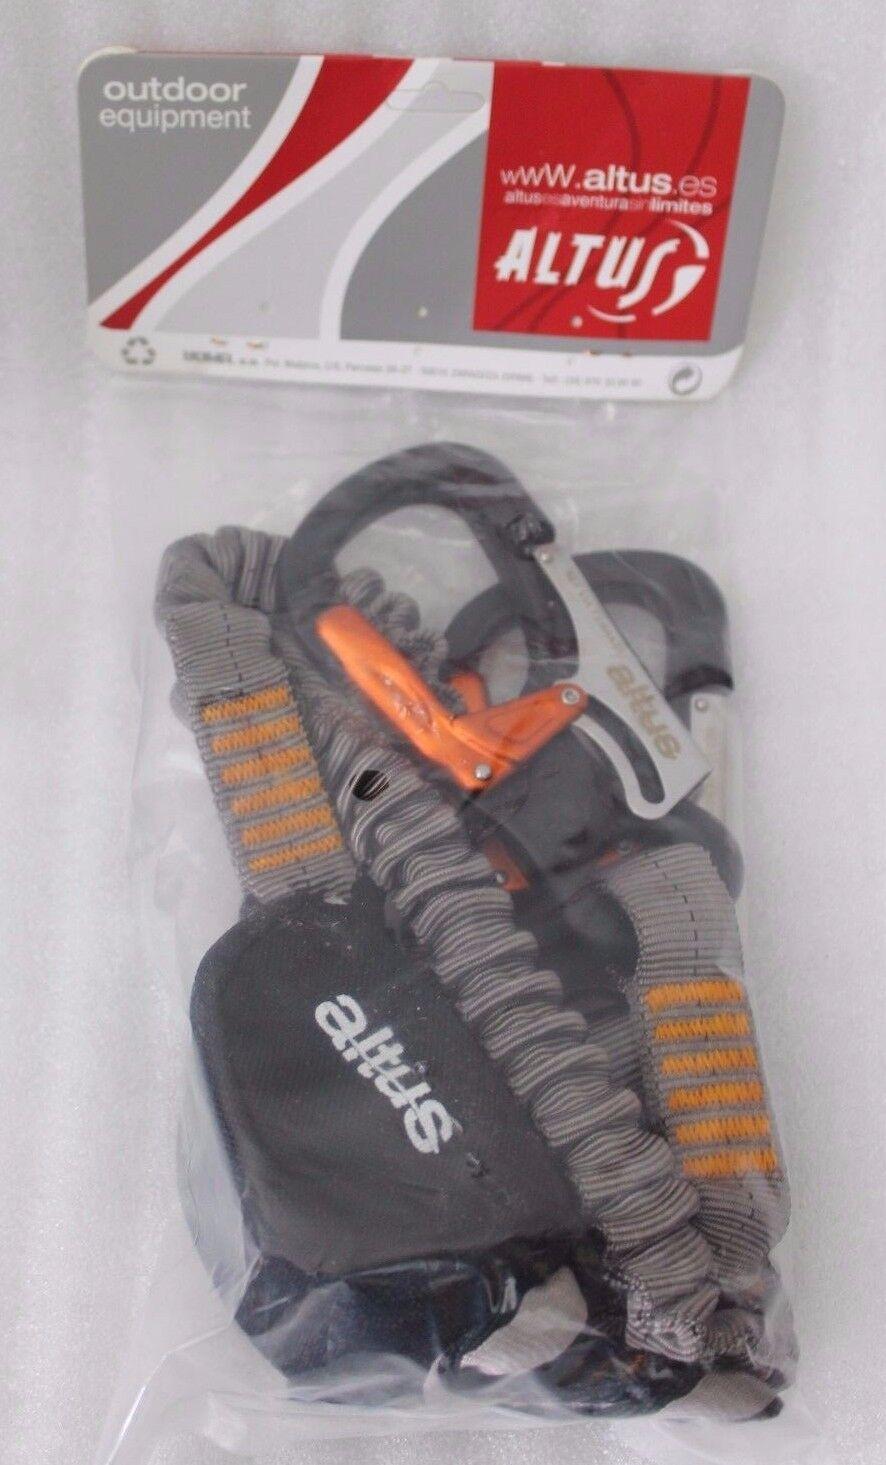 Altus Set via Ferrata autoabiniere Backup 9200601 nuovo A